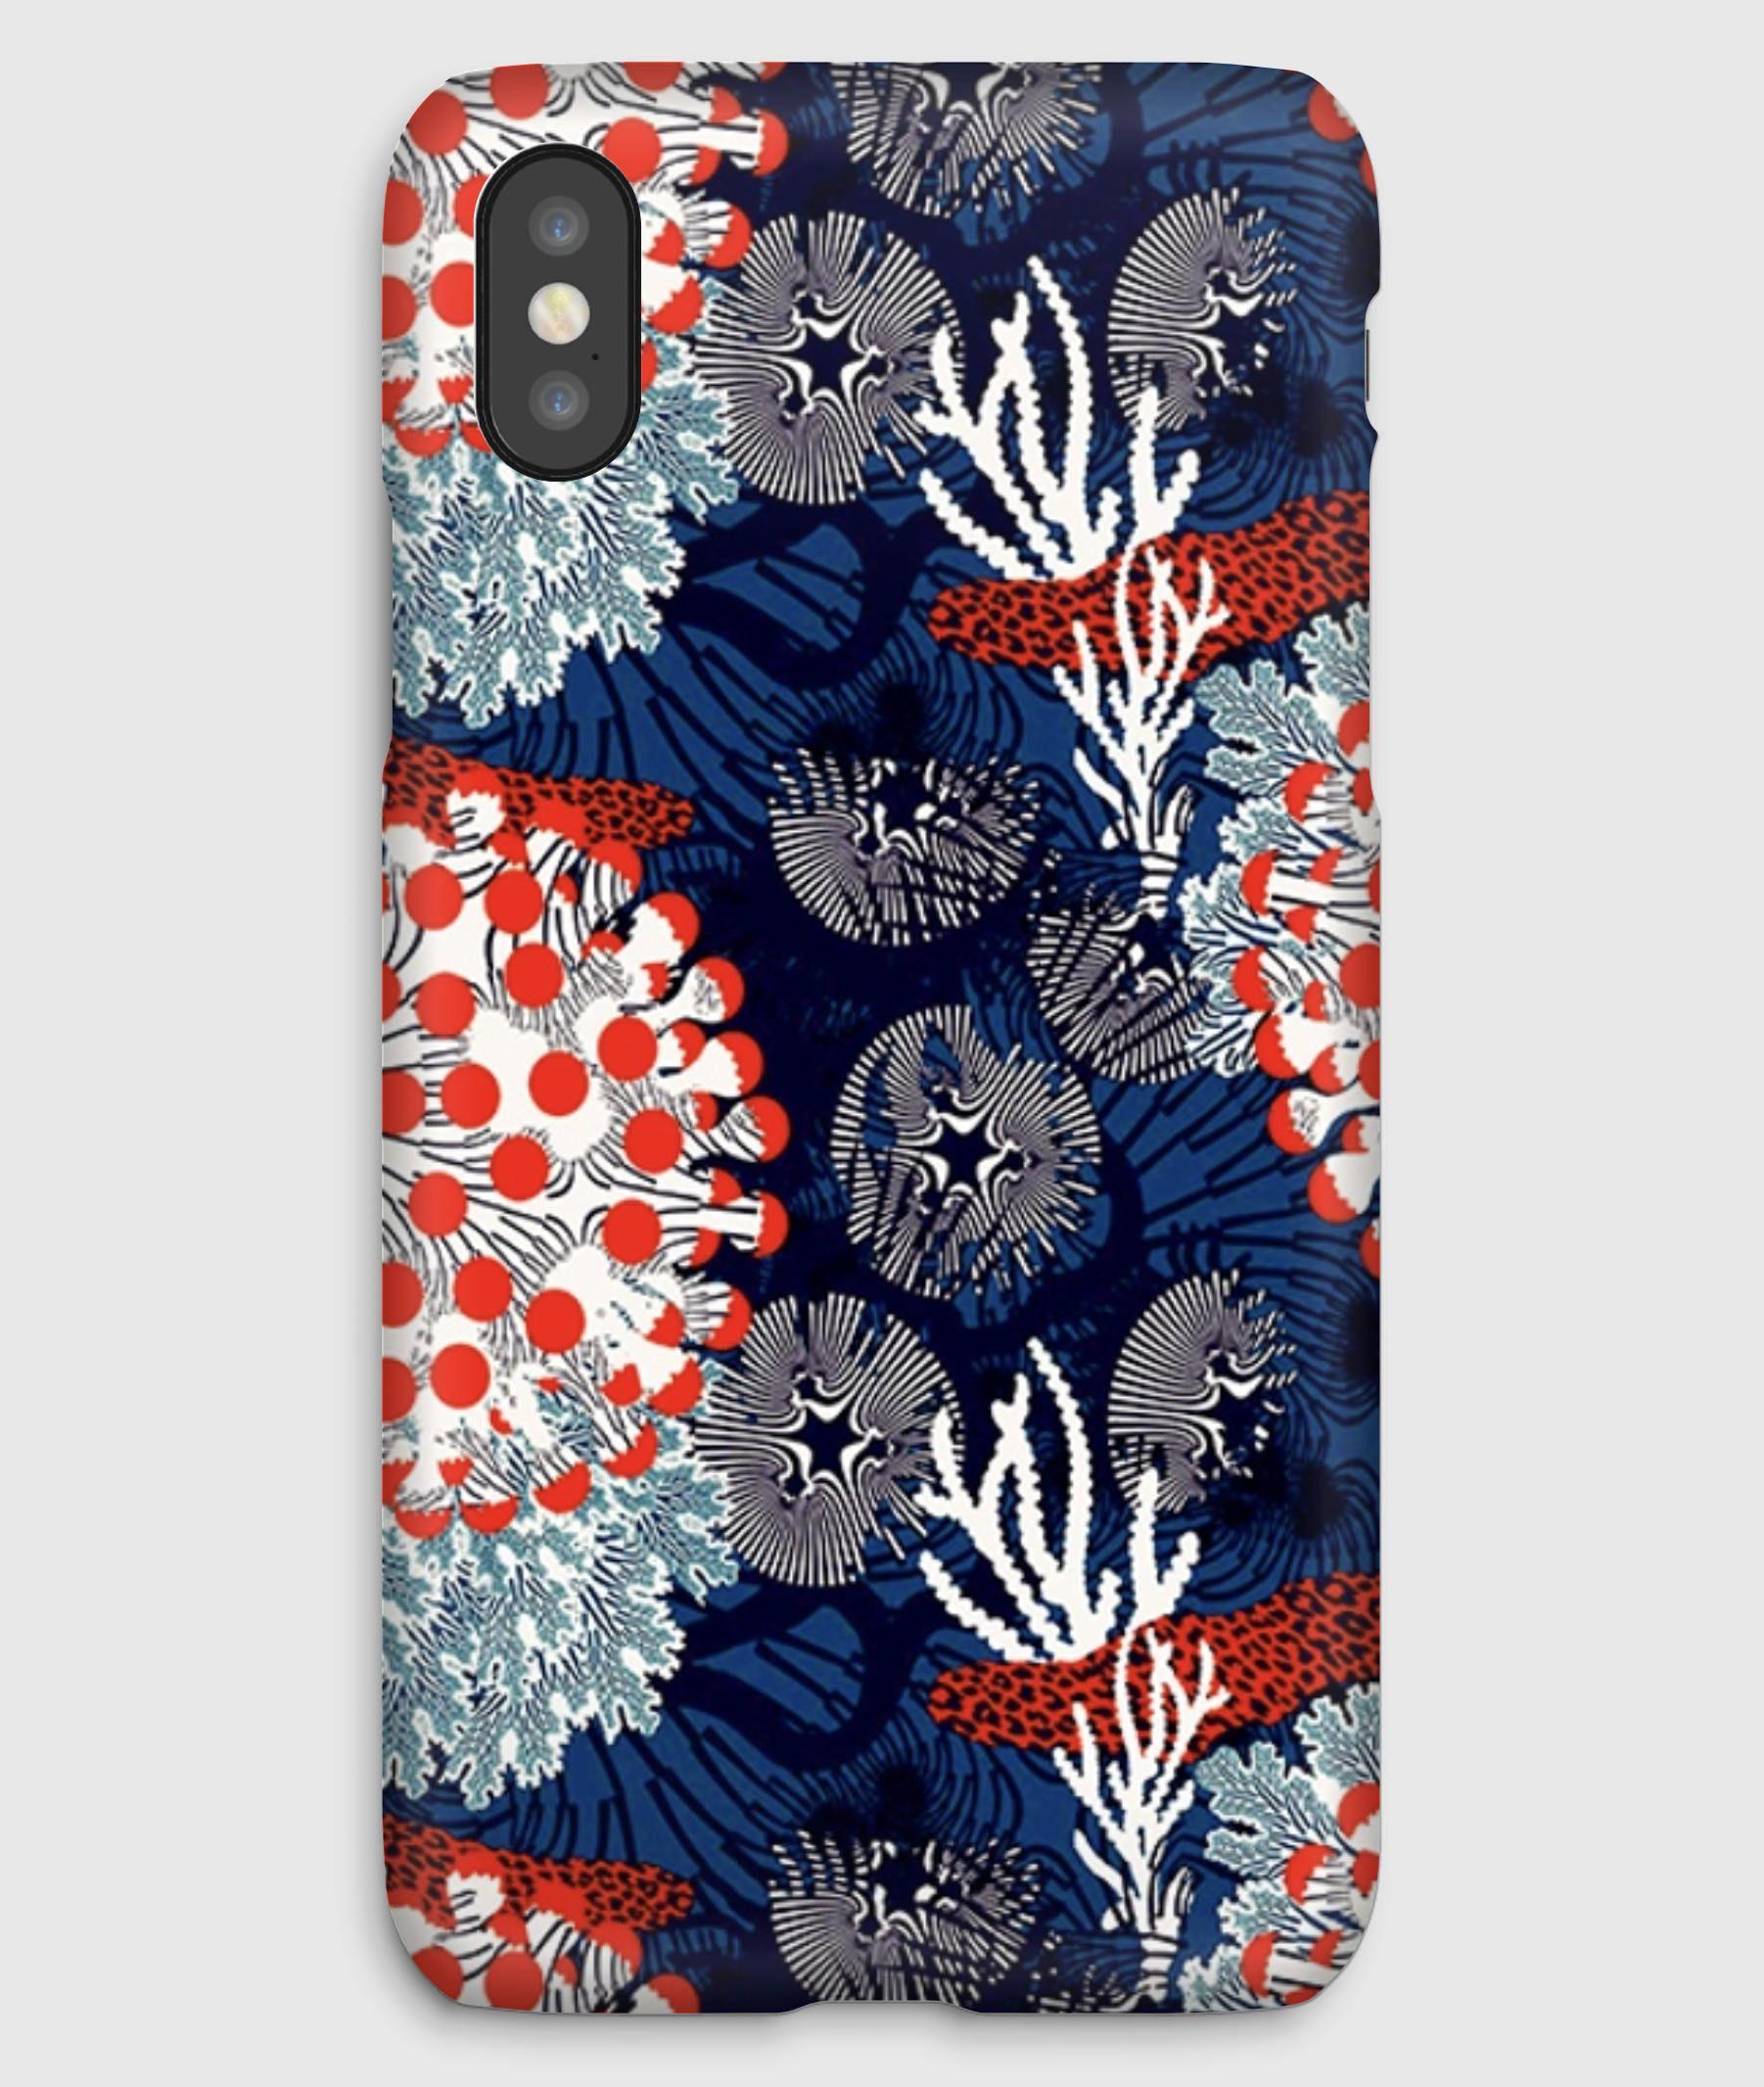 timeless design df349 26f3a Liberty marimekko, hard case for iPhone XS, XS Max, XR, X, 8, 8, 7 ...